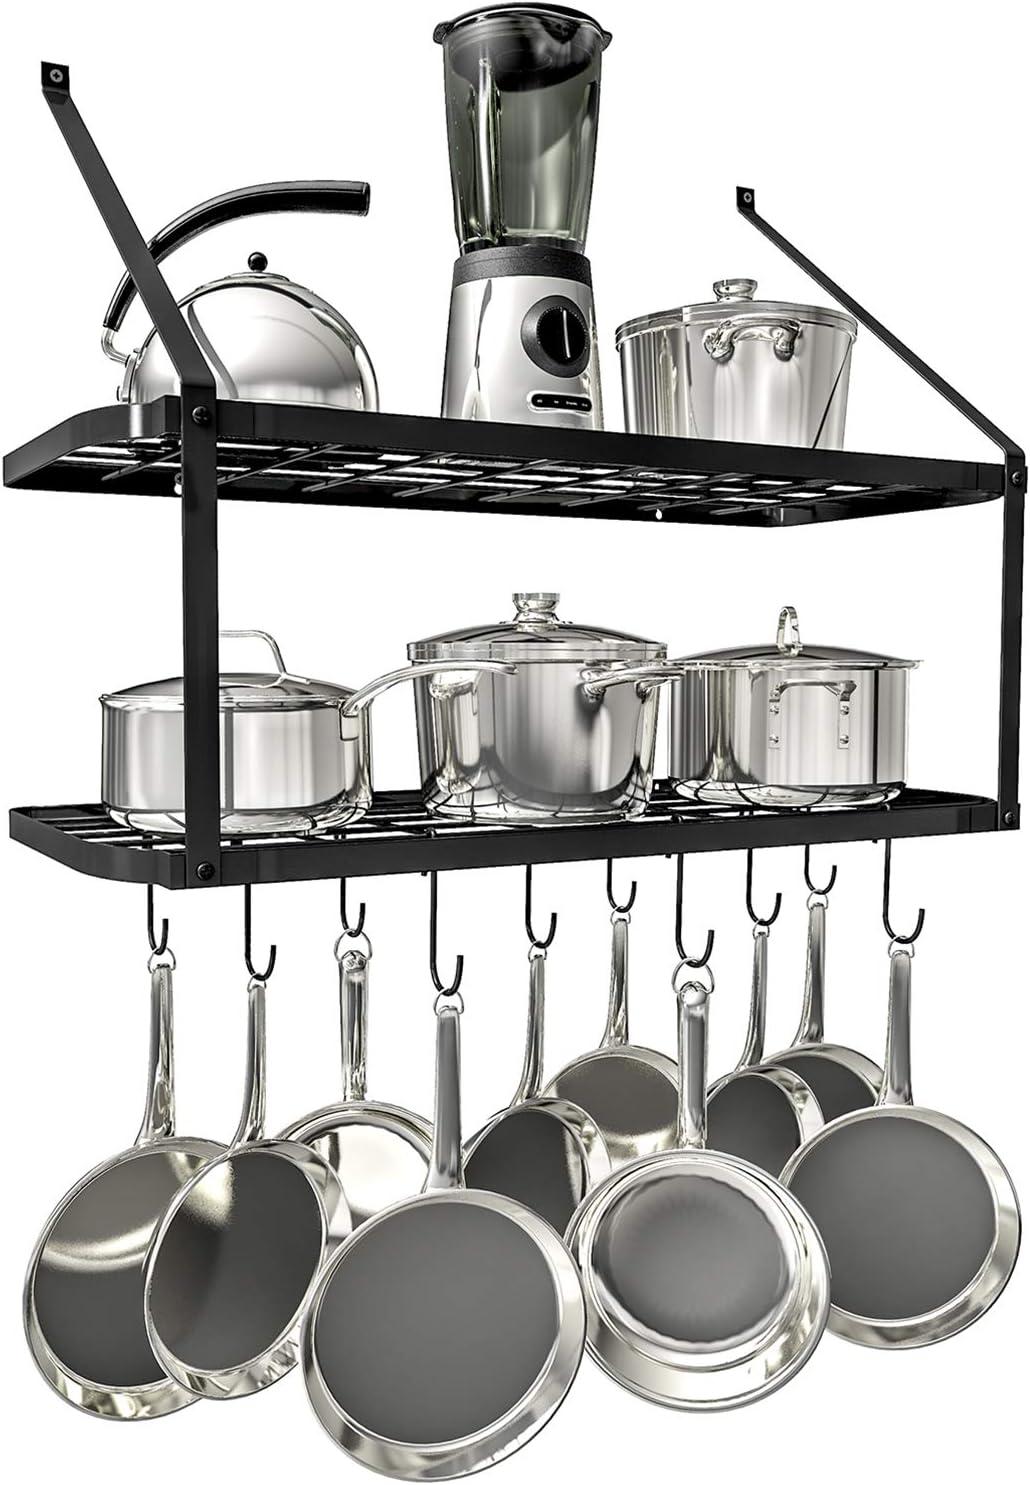 Vdomus shelf pot rack wall mounted 2 bla tire racks pan hanging Discount mail order Import